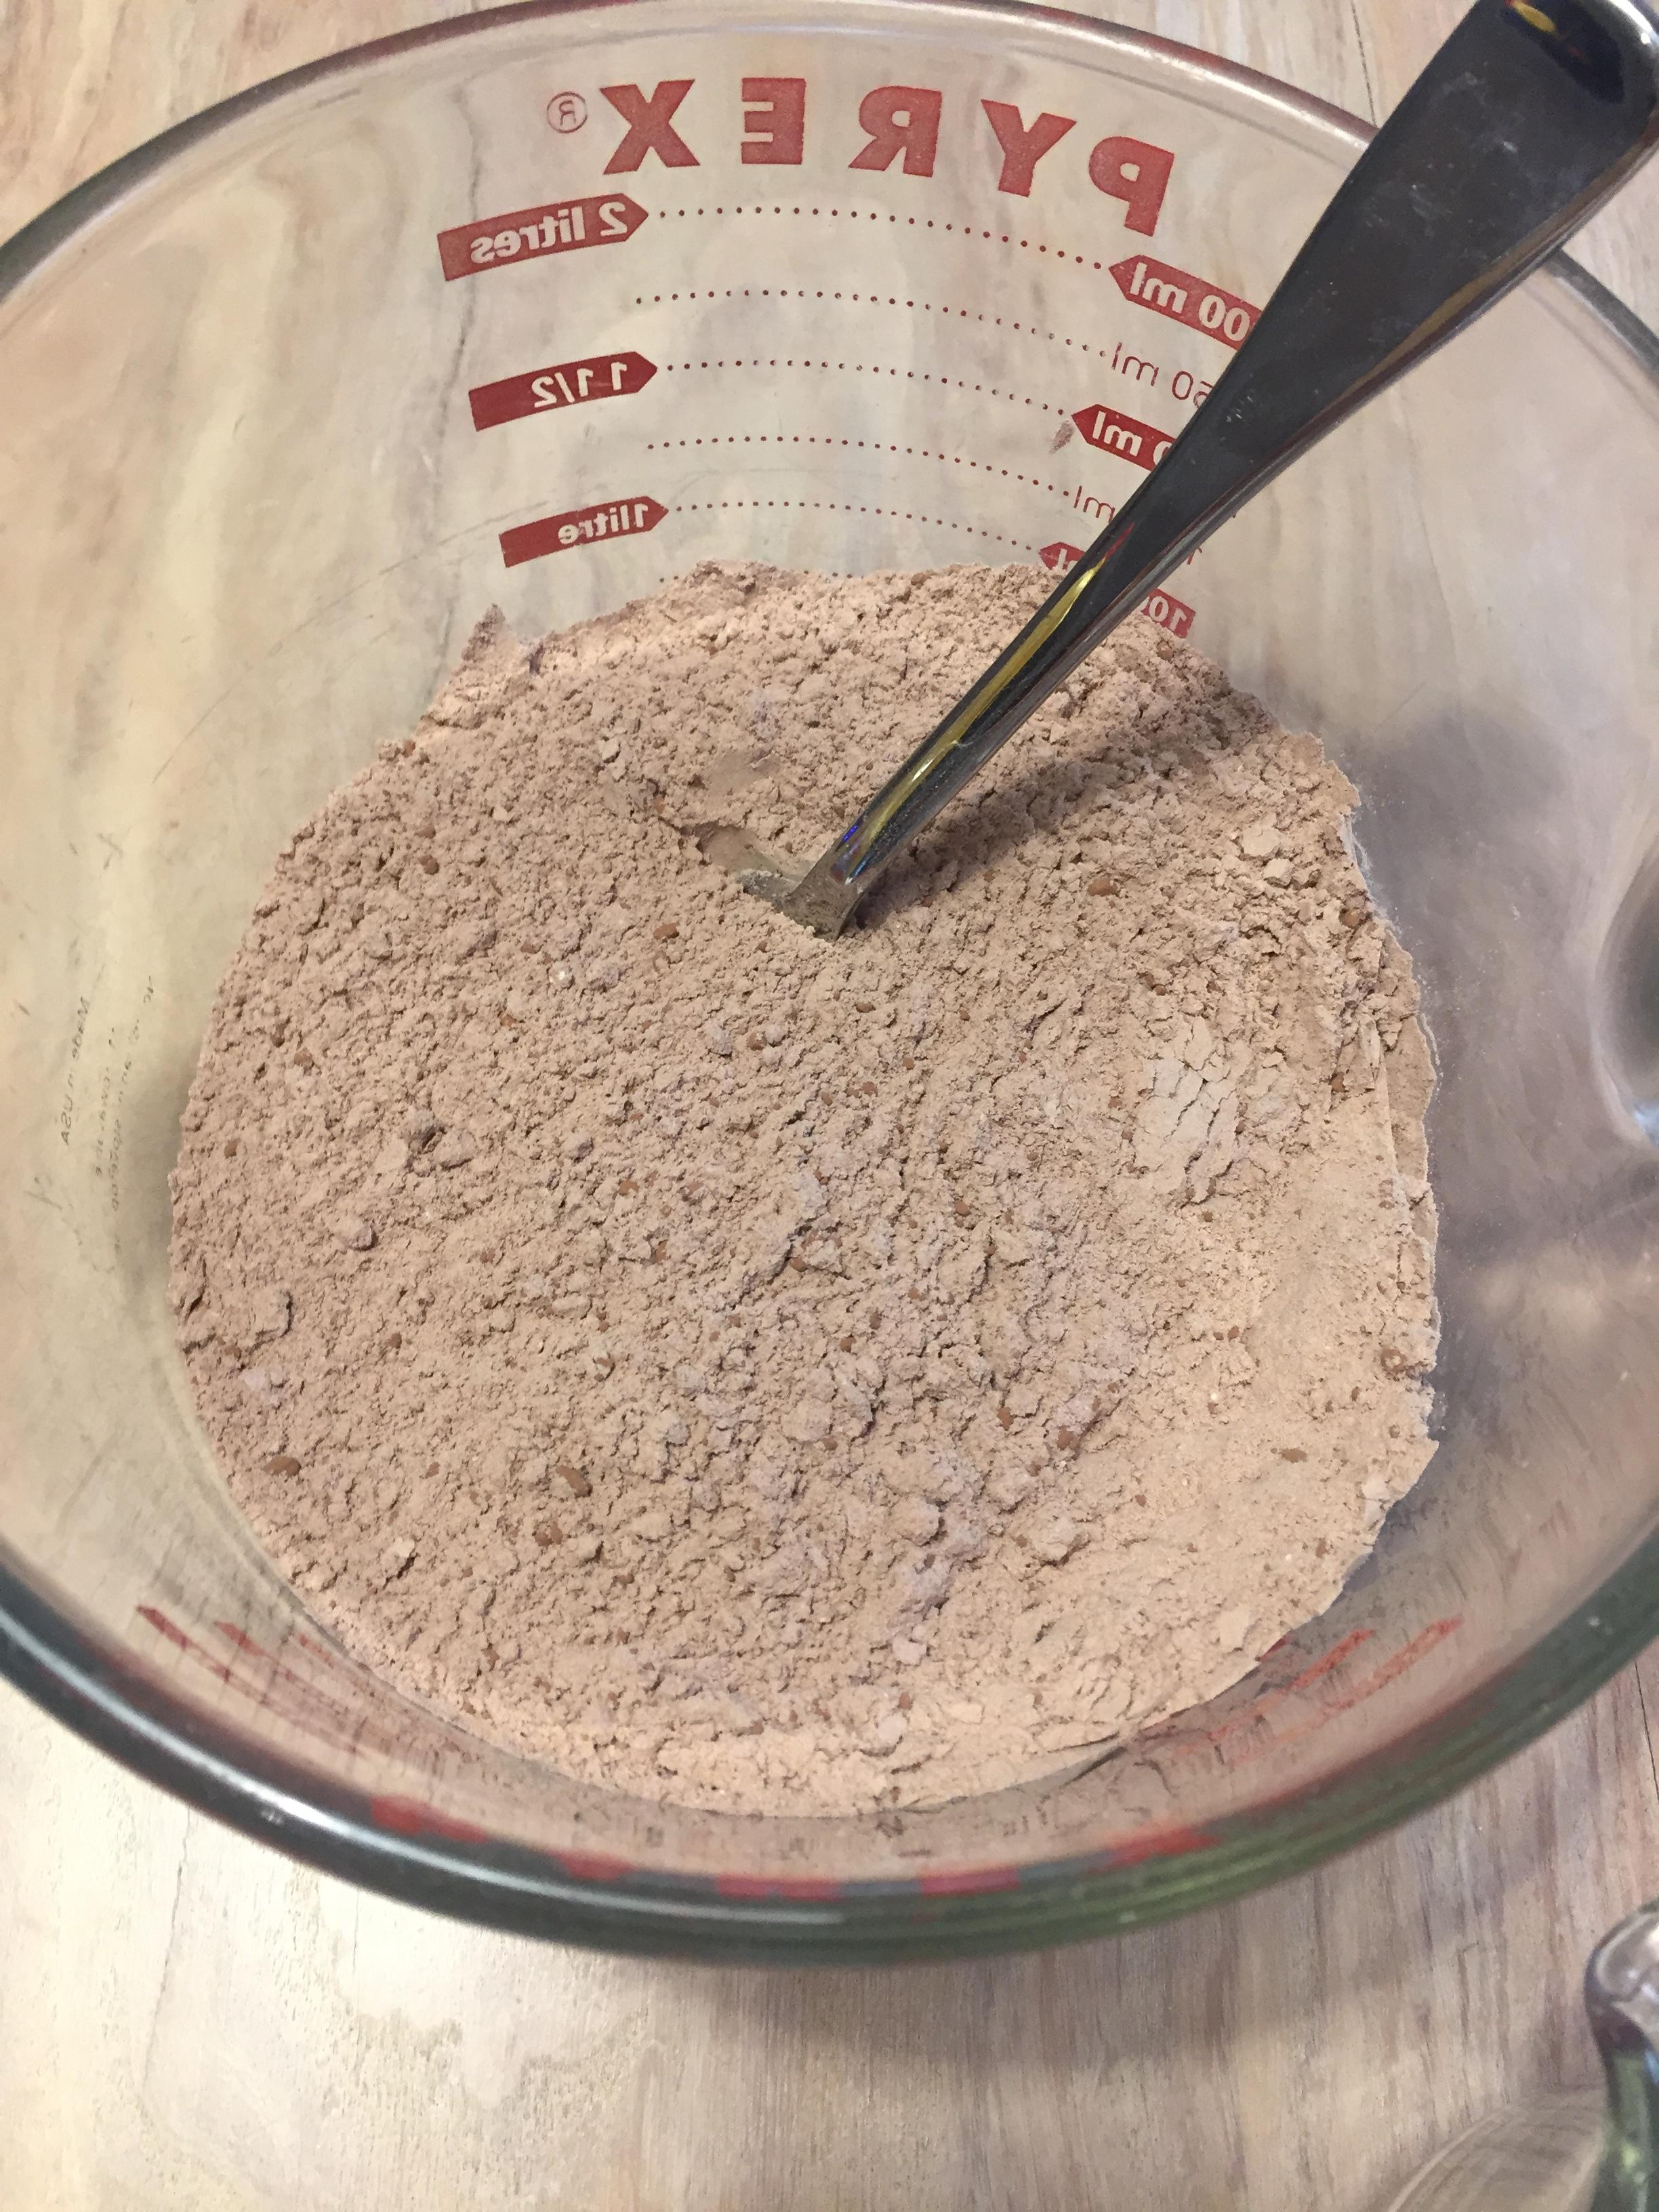 Mix the flour, cocoa, baking soda, and salt.